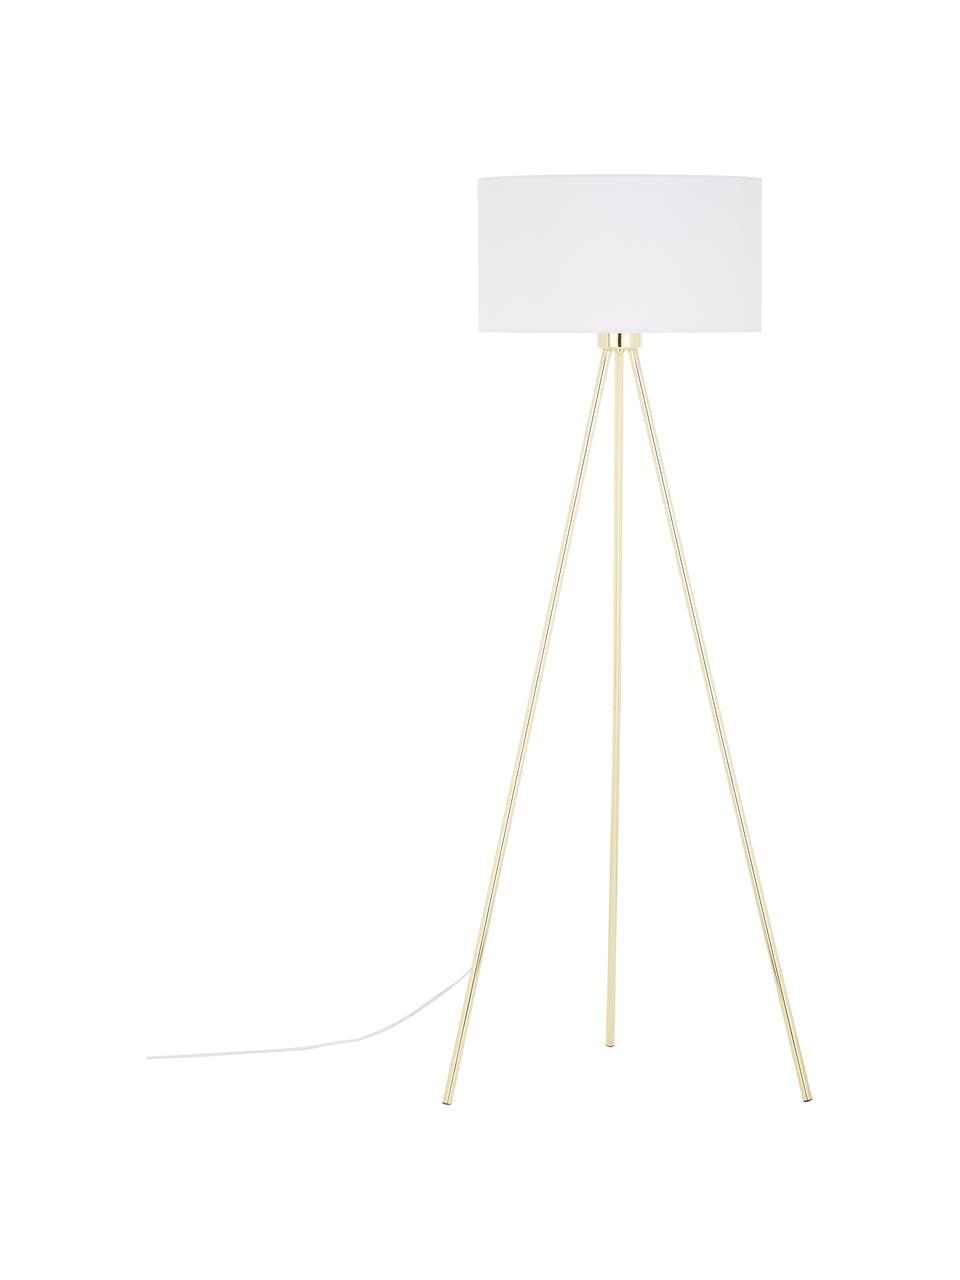 Lampada da terra con paralume in tessuto Cella, Paralume: misto cotone Base della l, Base della lampada: dorato lucido Paralume: bianco, Ø 48 x Alt. 158 cm